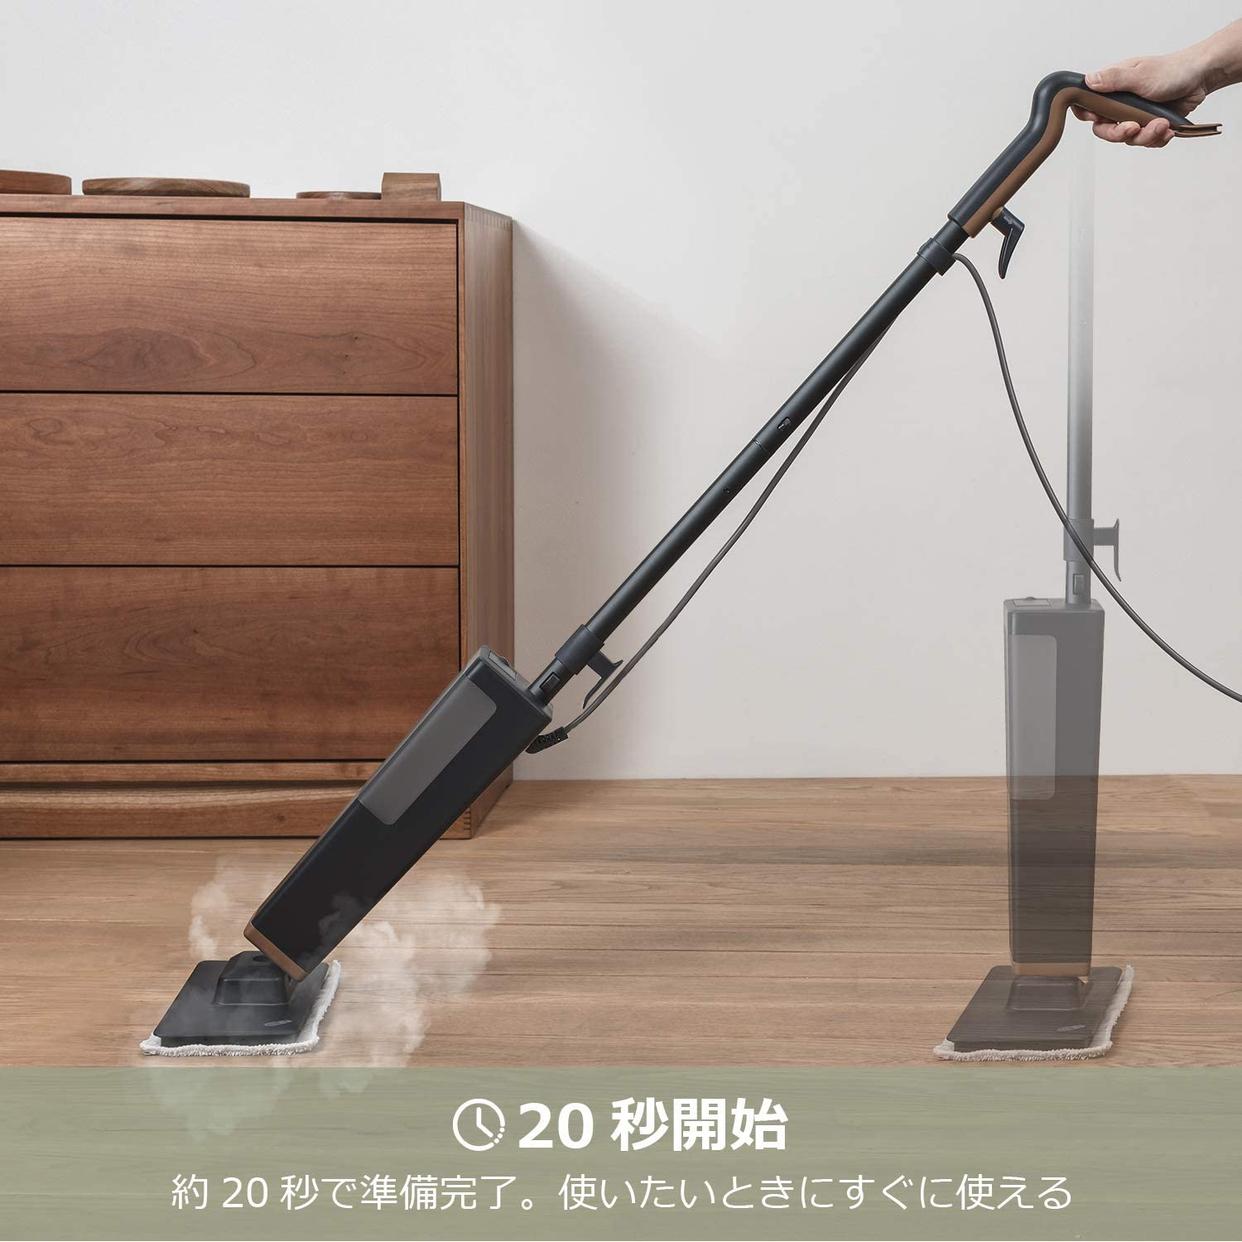 &ELEPGANT(アンドエレファント) Light'n'Easy SteamGo モップタイプ S5の商品画像2